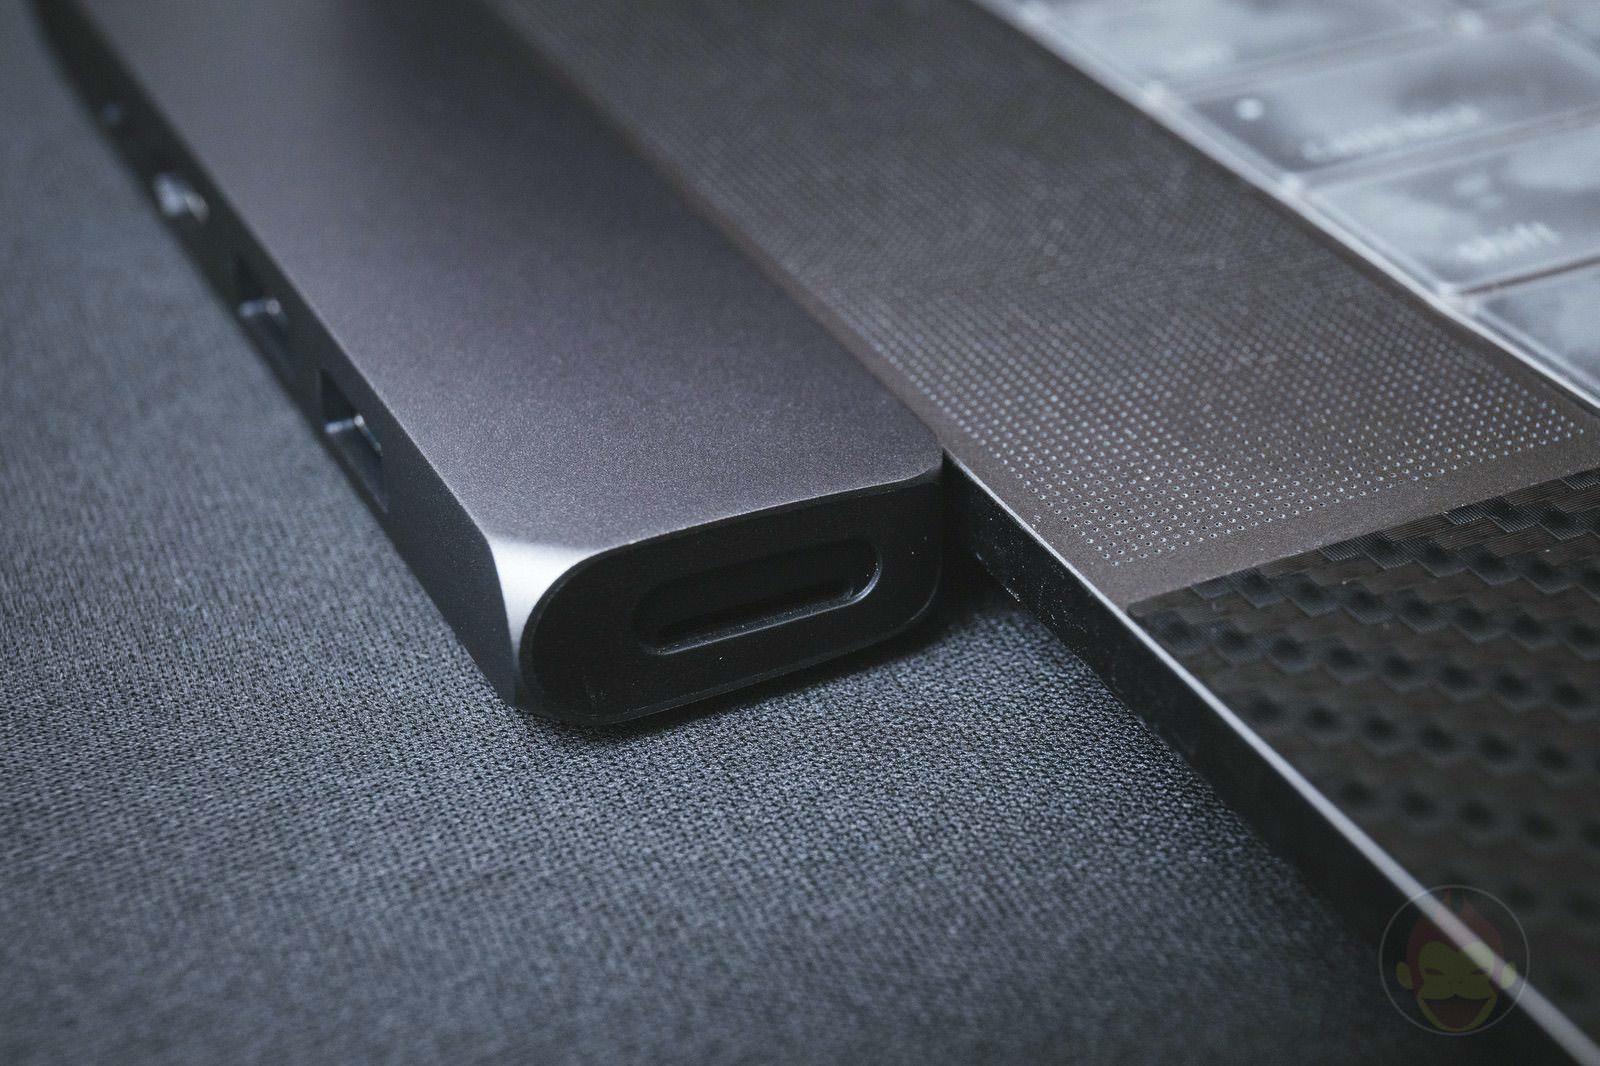 Satechi-Aluminum-Type-c-Pro-Hub-08.jpg